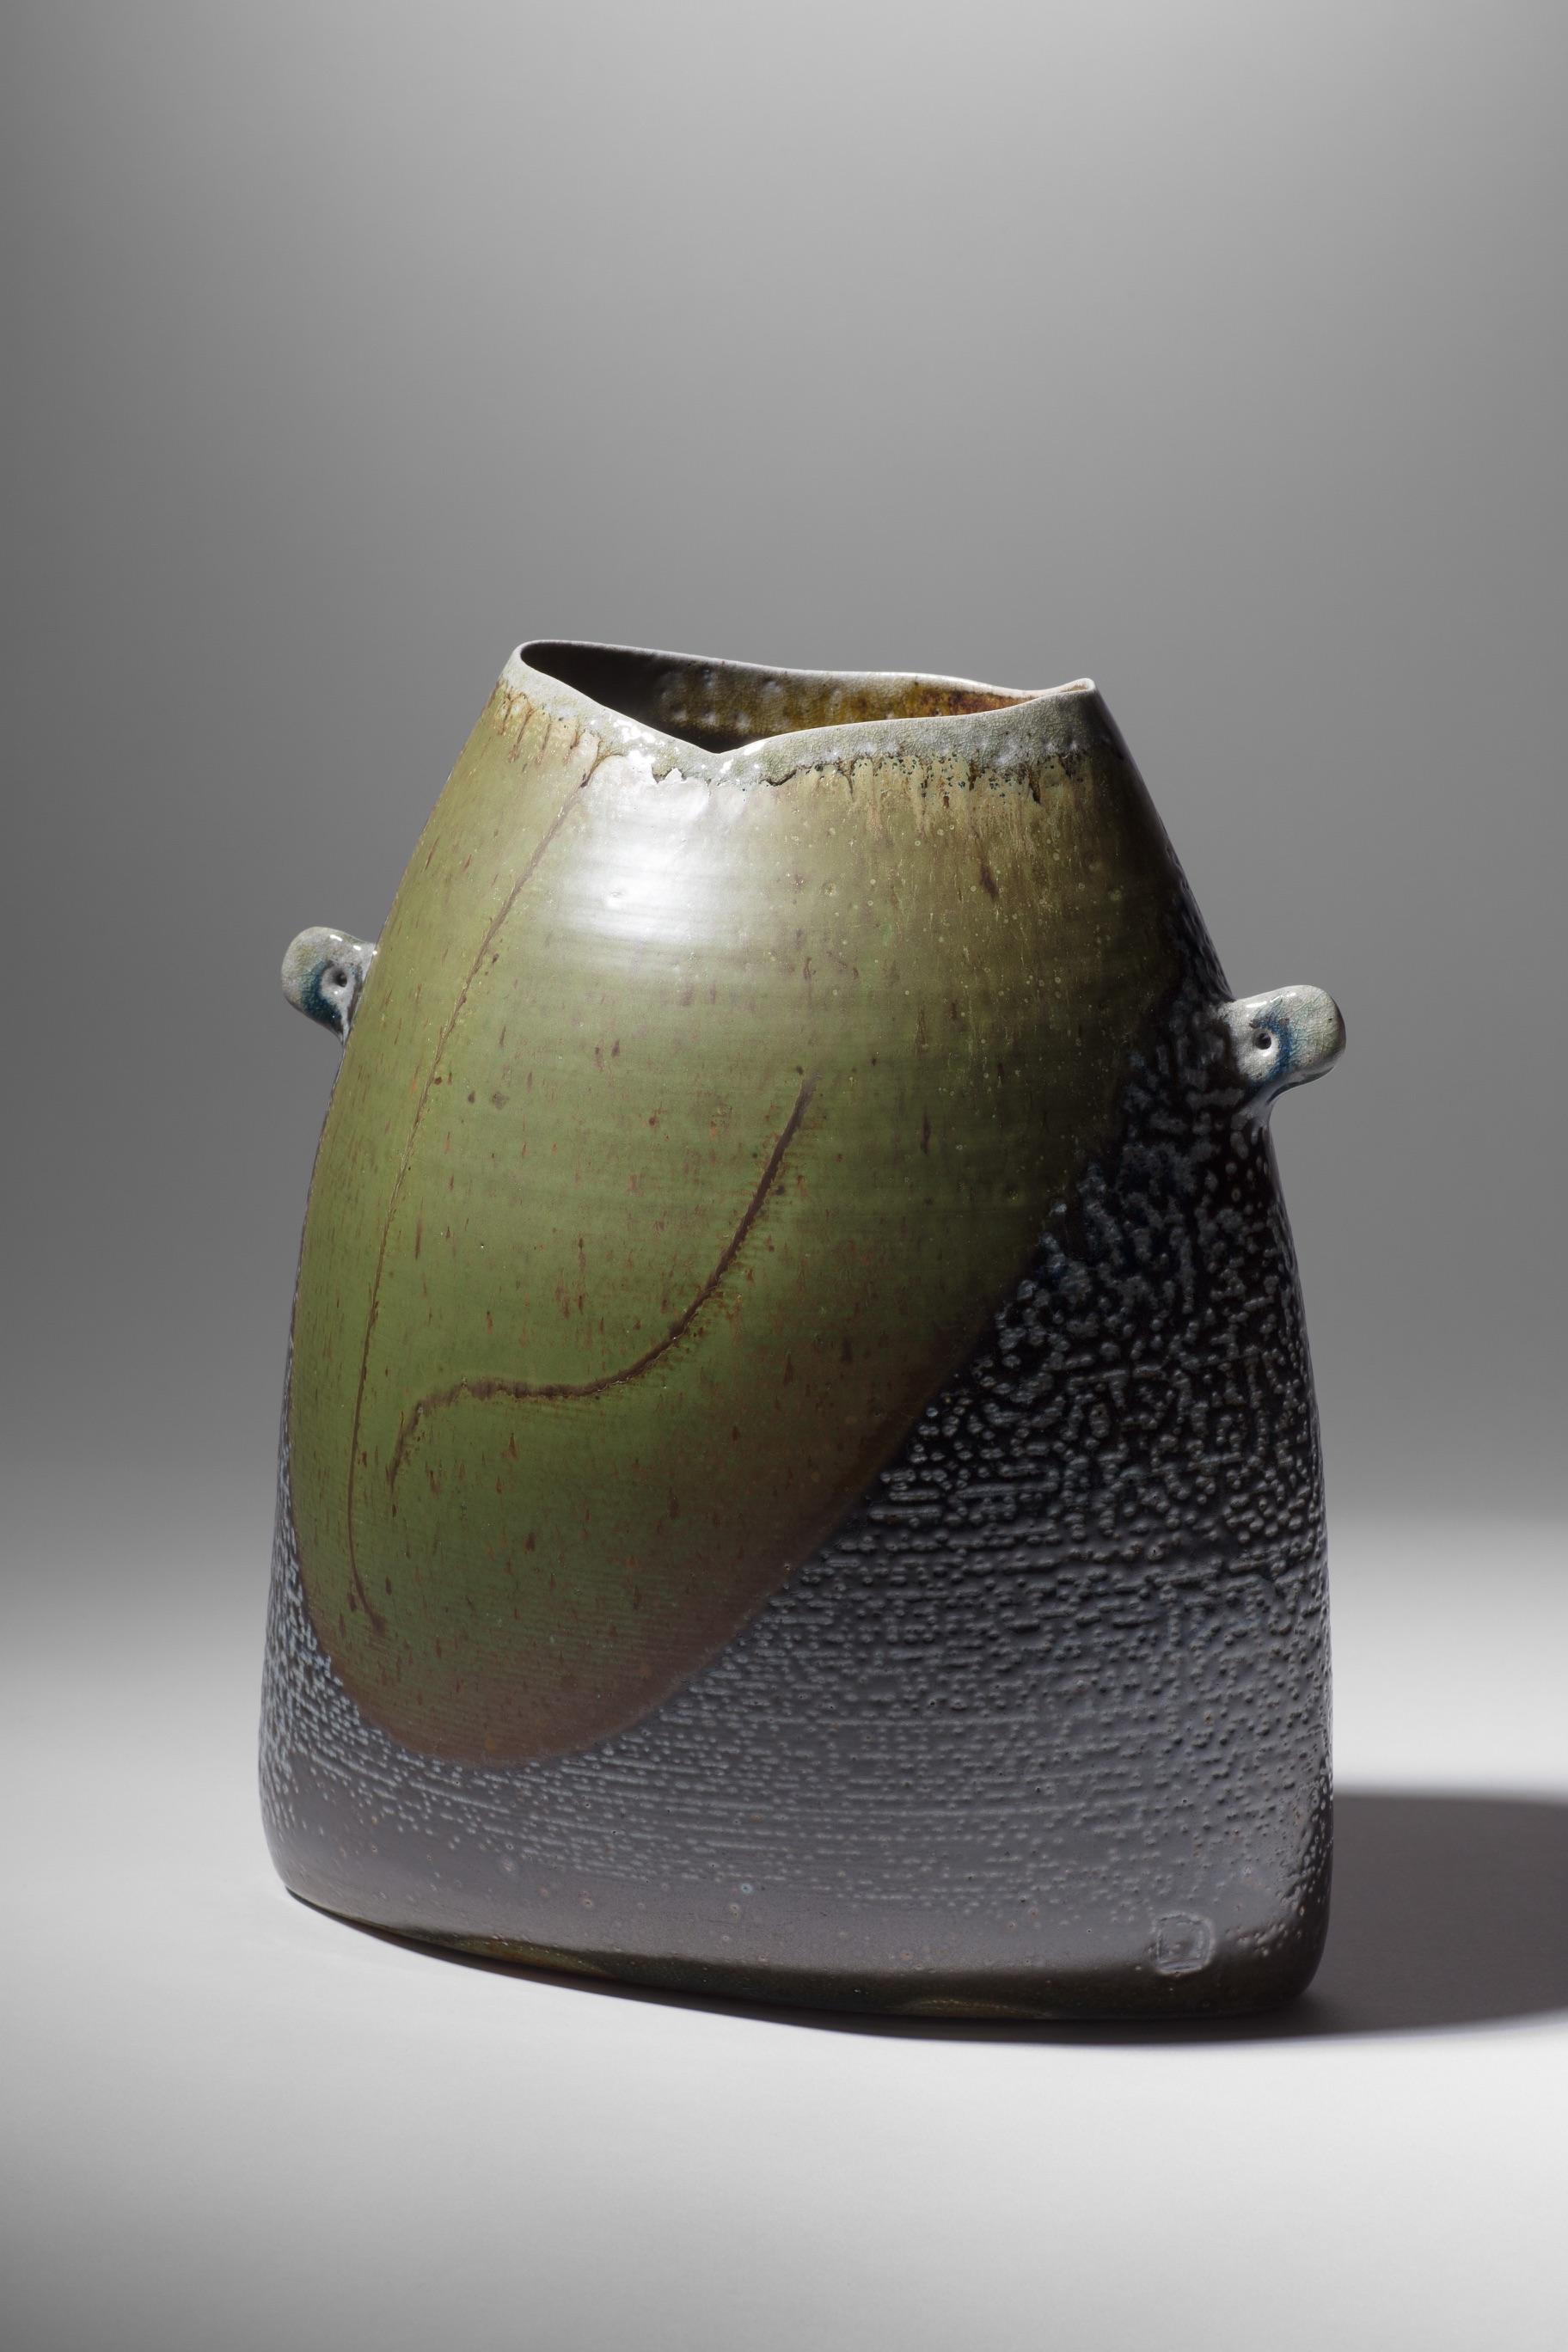 Mandy Parslow, MP10 Handled Elliptical Vessel, wood fired salt glazed stoneware, 26 x 25 x 14cm, EUR 560